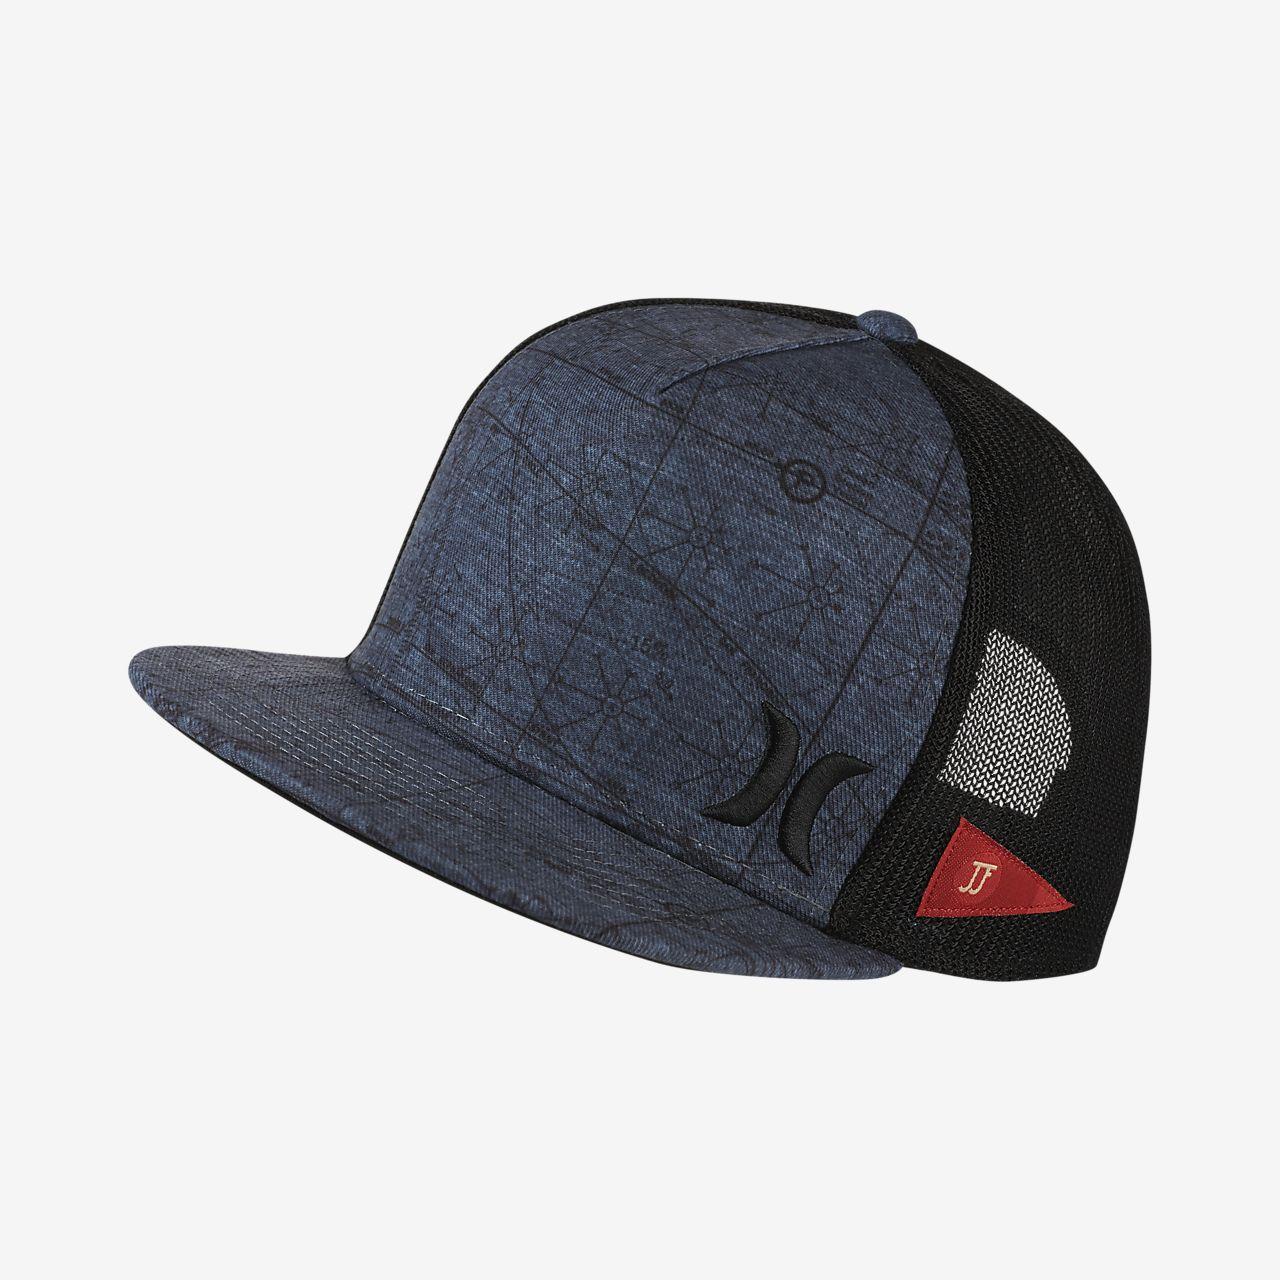 2a8c294b7bd Hurley JJF Maps Trucker Men s Adjustable Hat. Nike.com AE